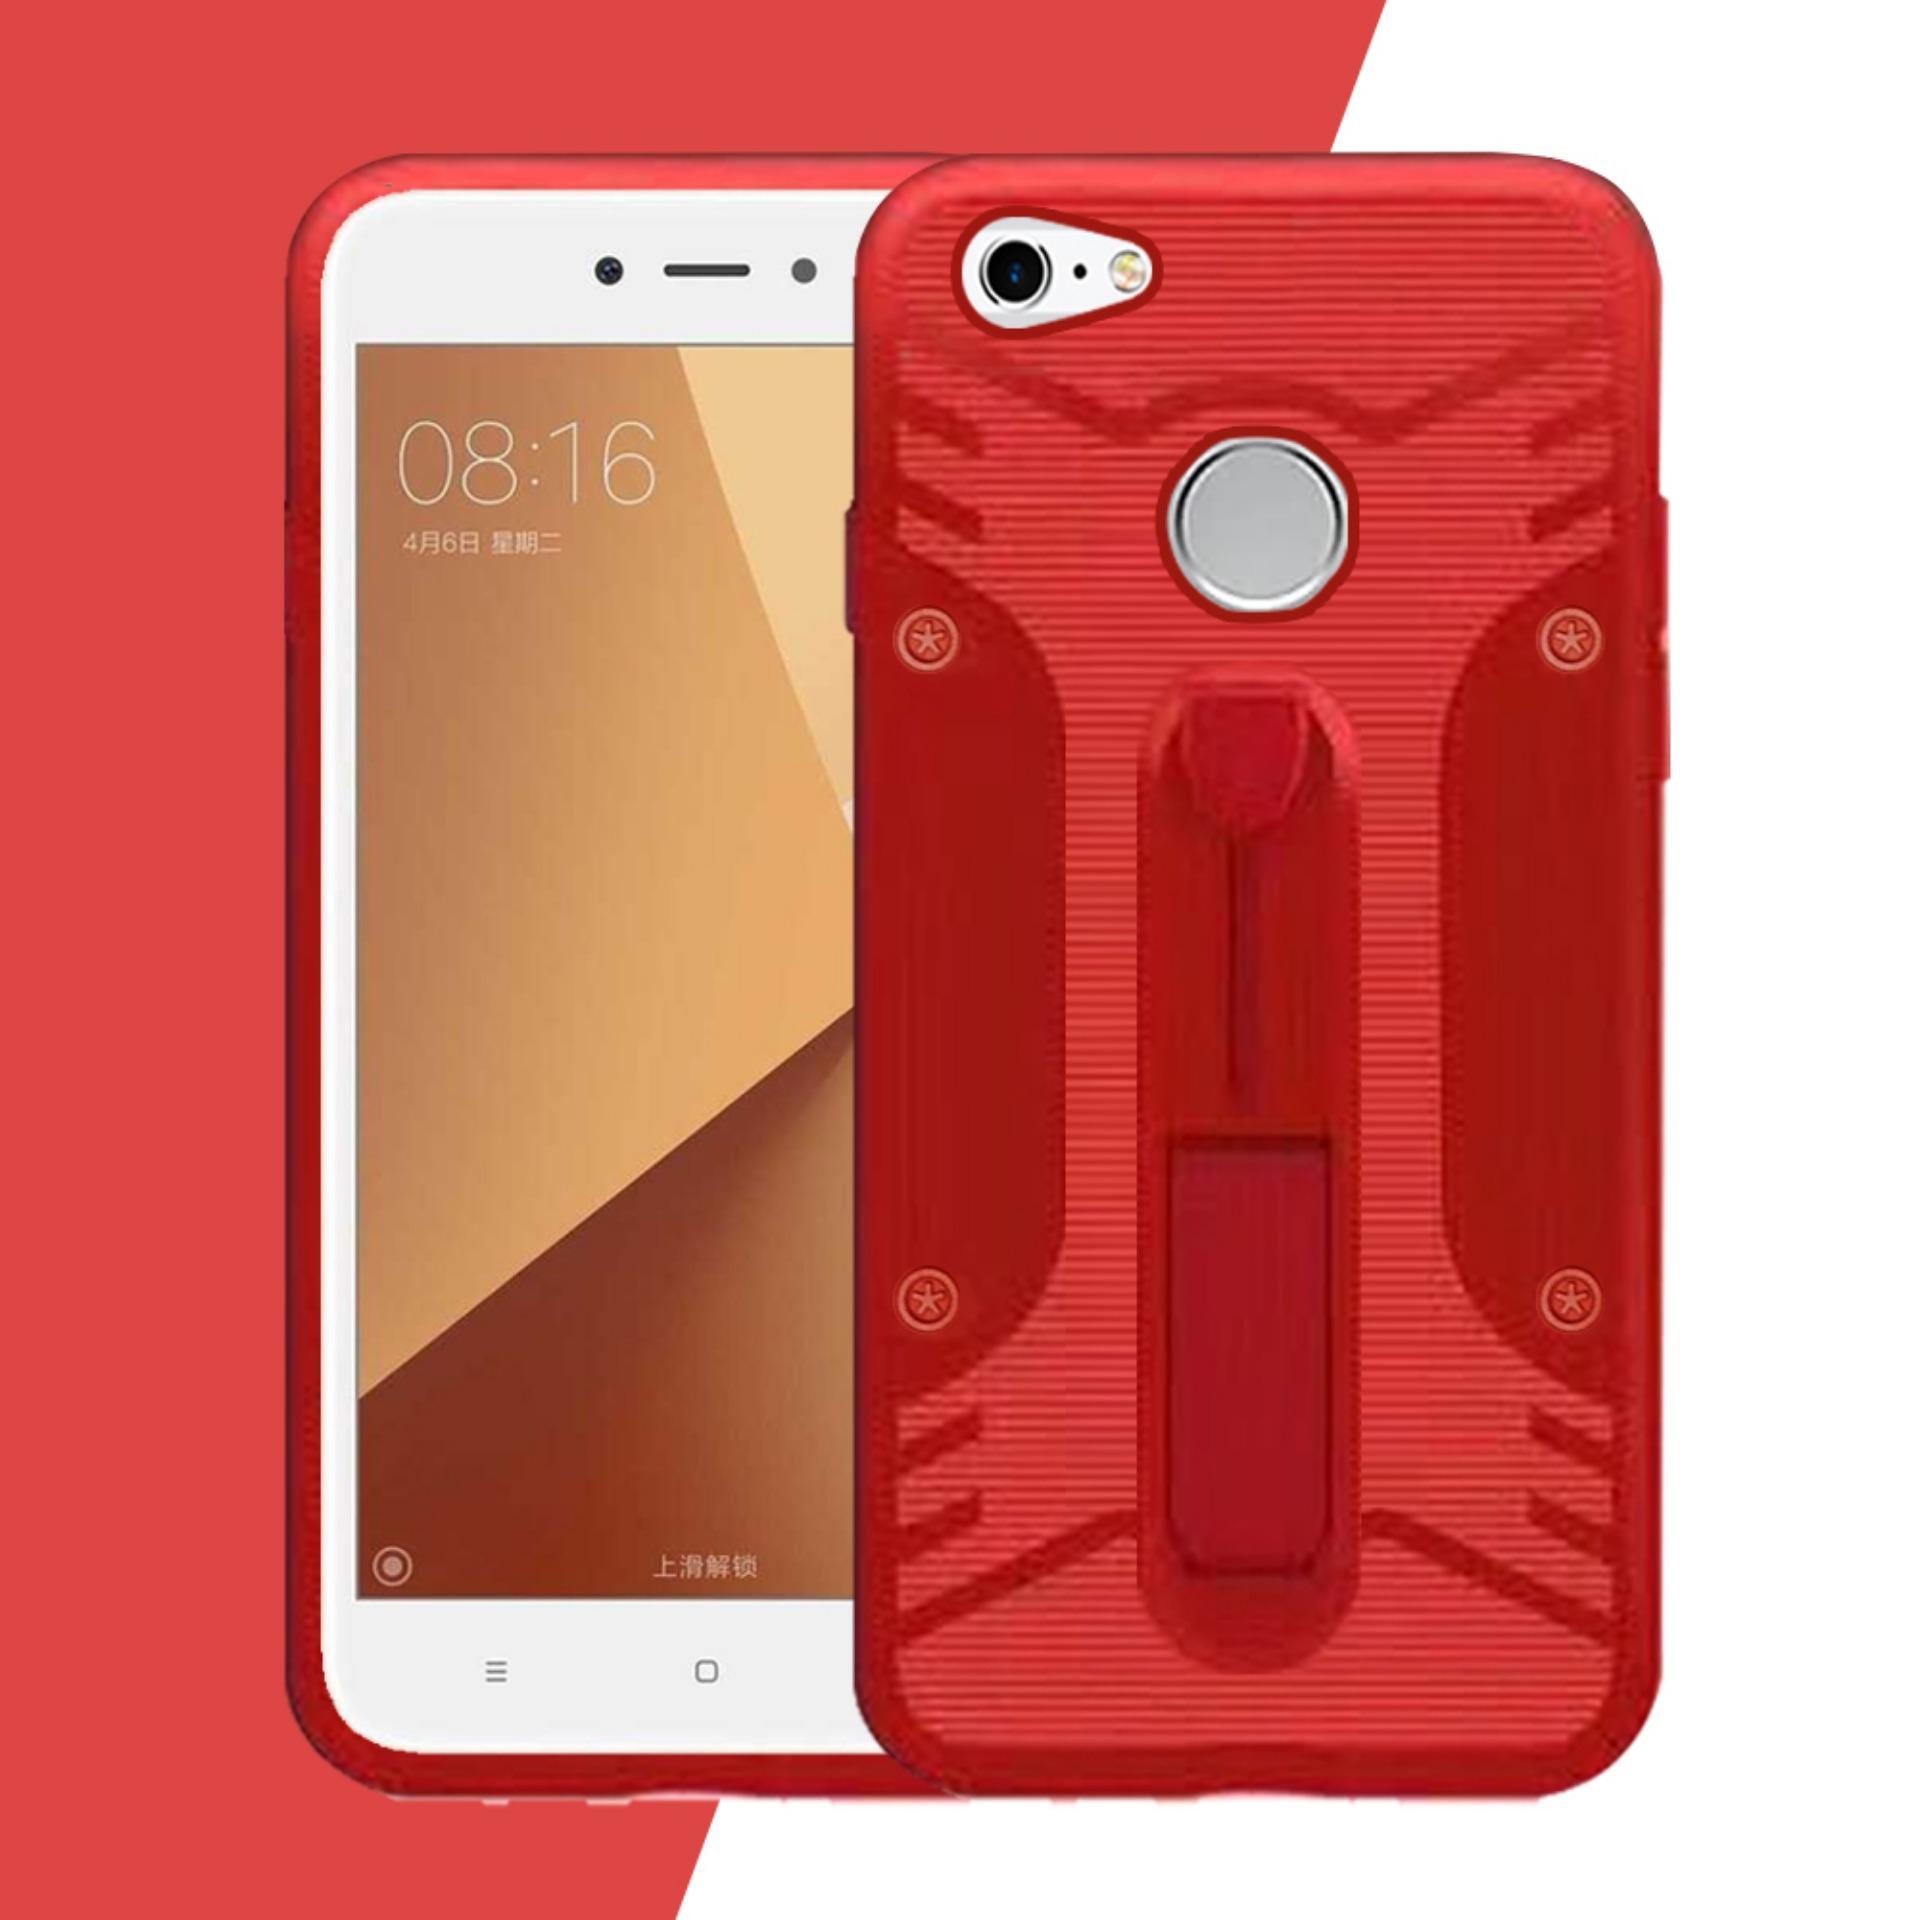 Case Xiaomi Redmi 4X Conure 3in1 Smart Grip COCOSE IPAKY Drop resistance anti Shock Silicone Cover